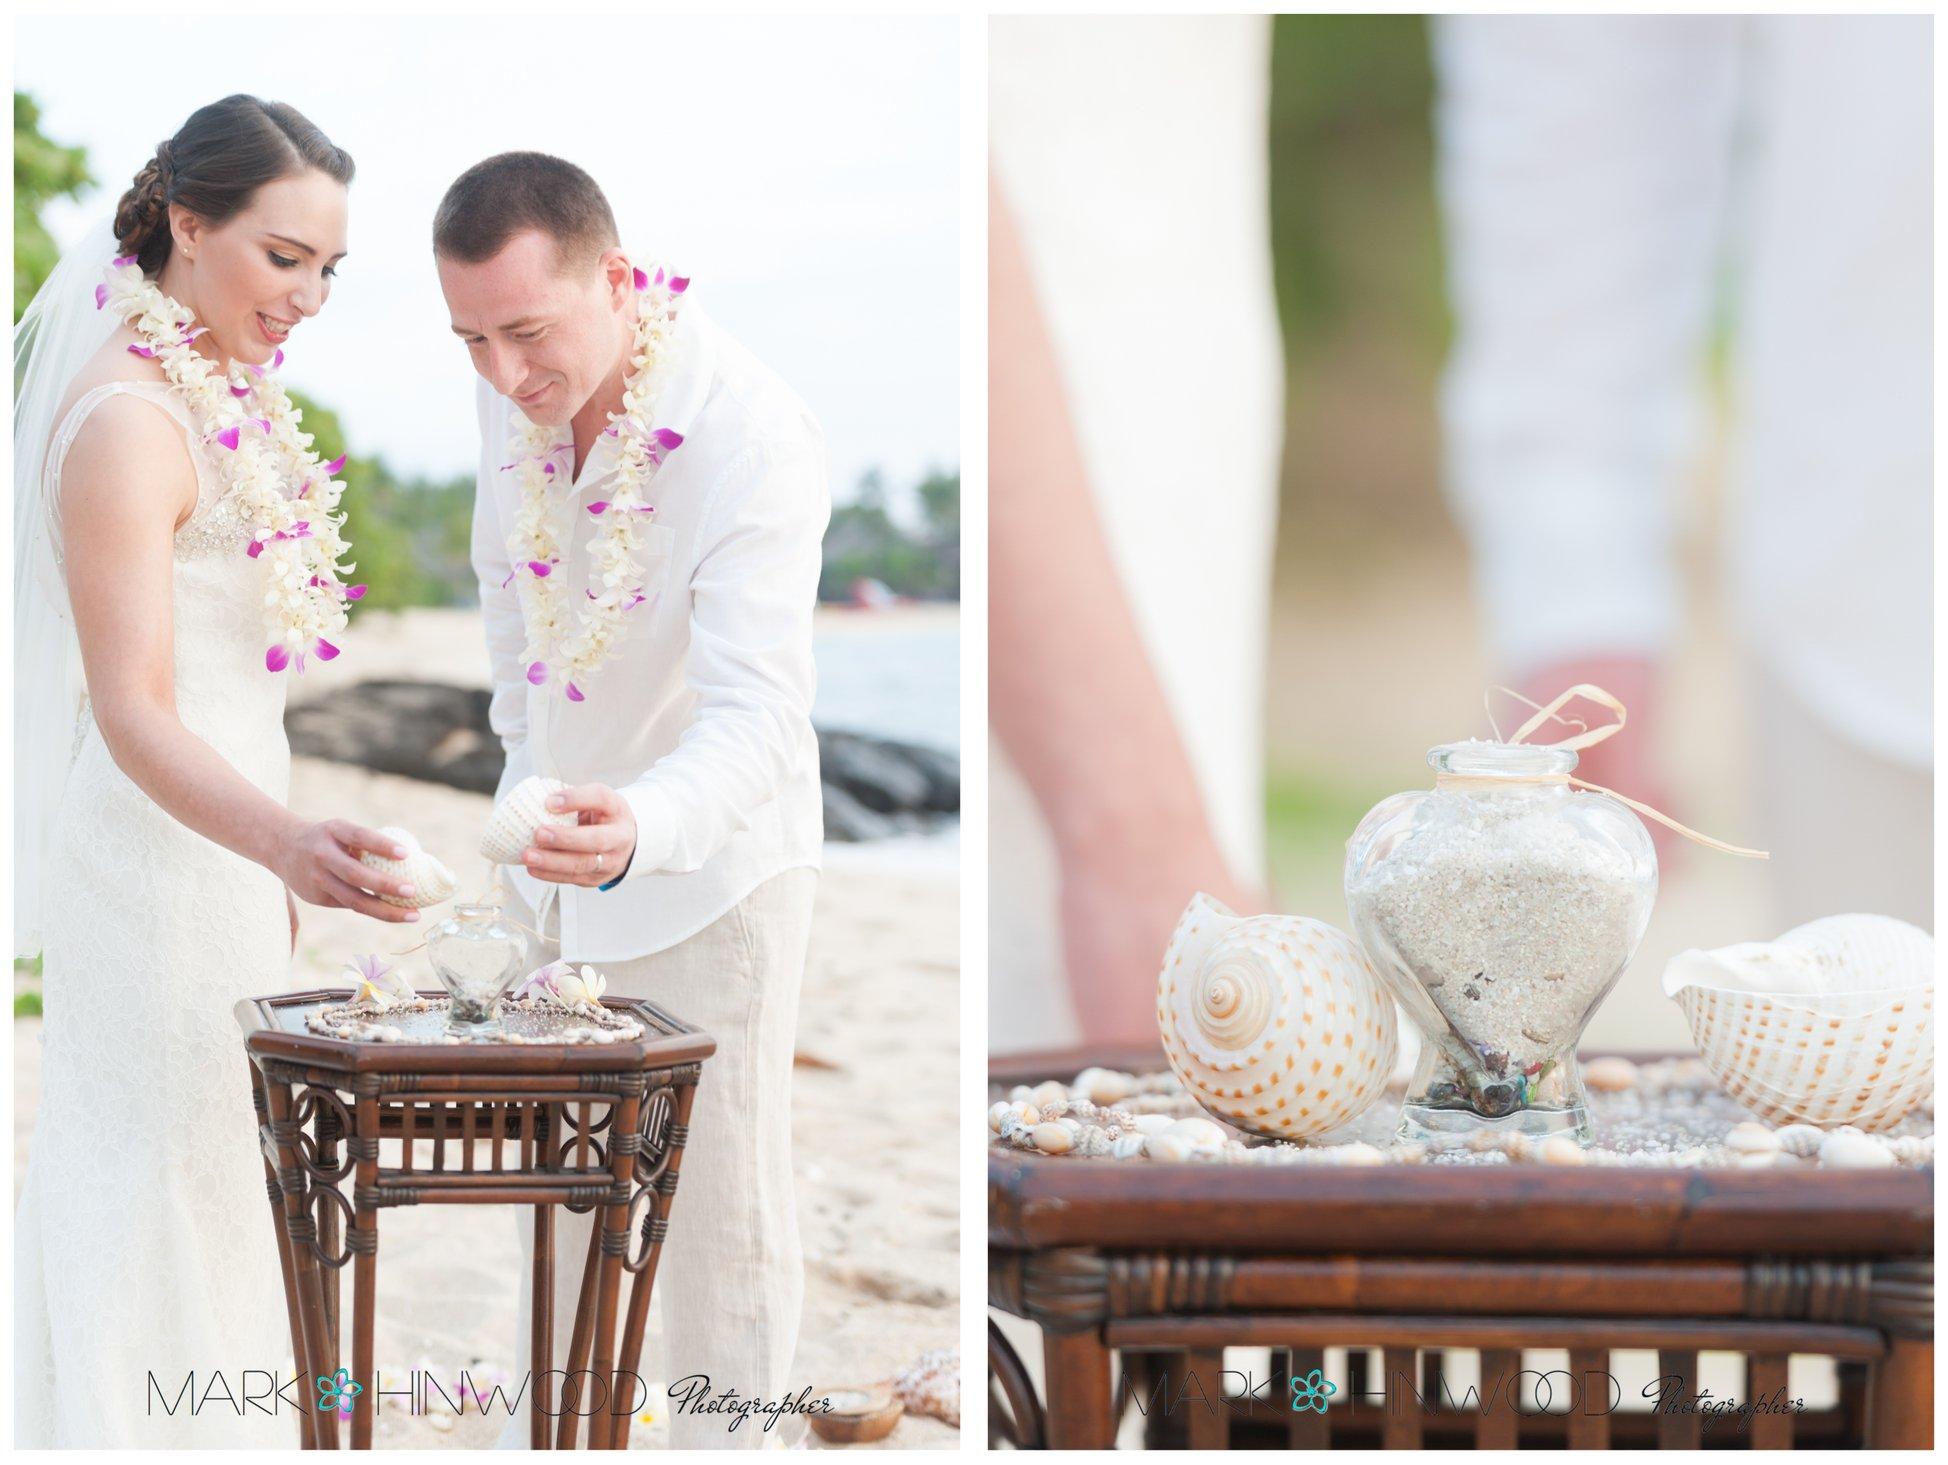 Top Kailua Kona Photographers 8